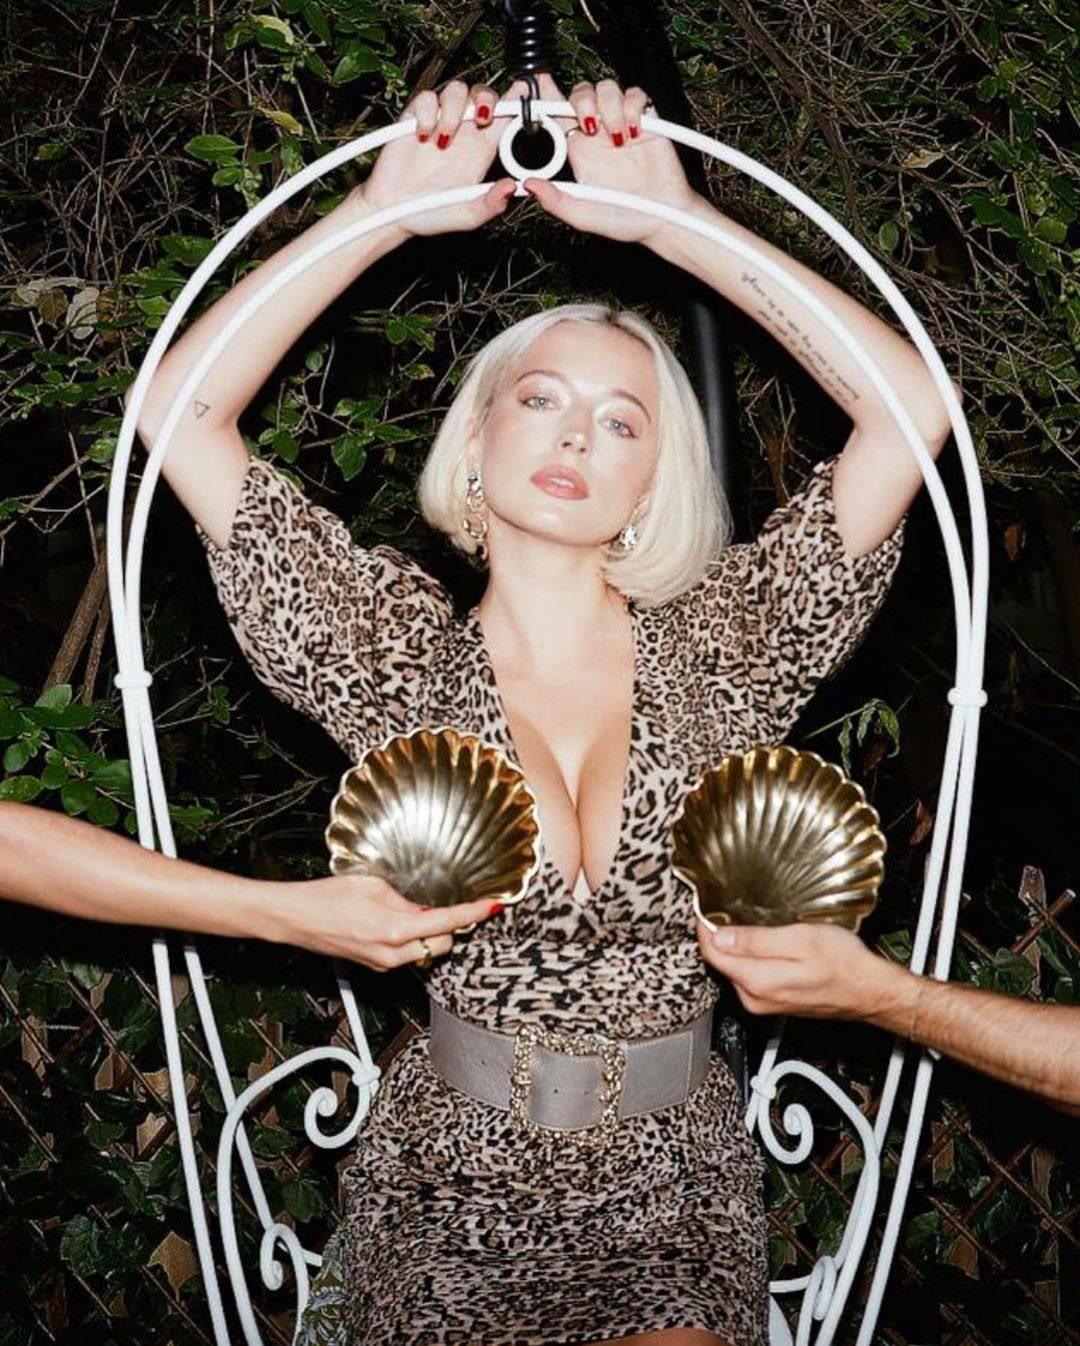 Caroline Vreeland – Sexy Big Boobs In Big Cleavage 0006